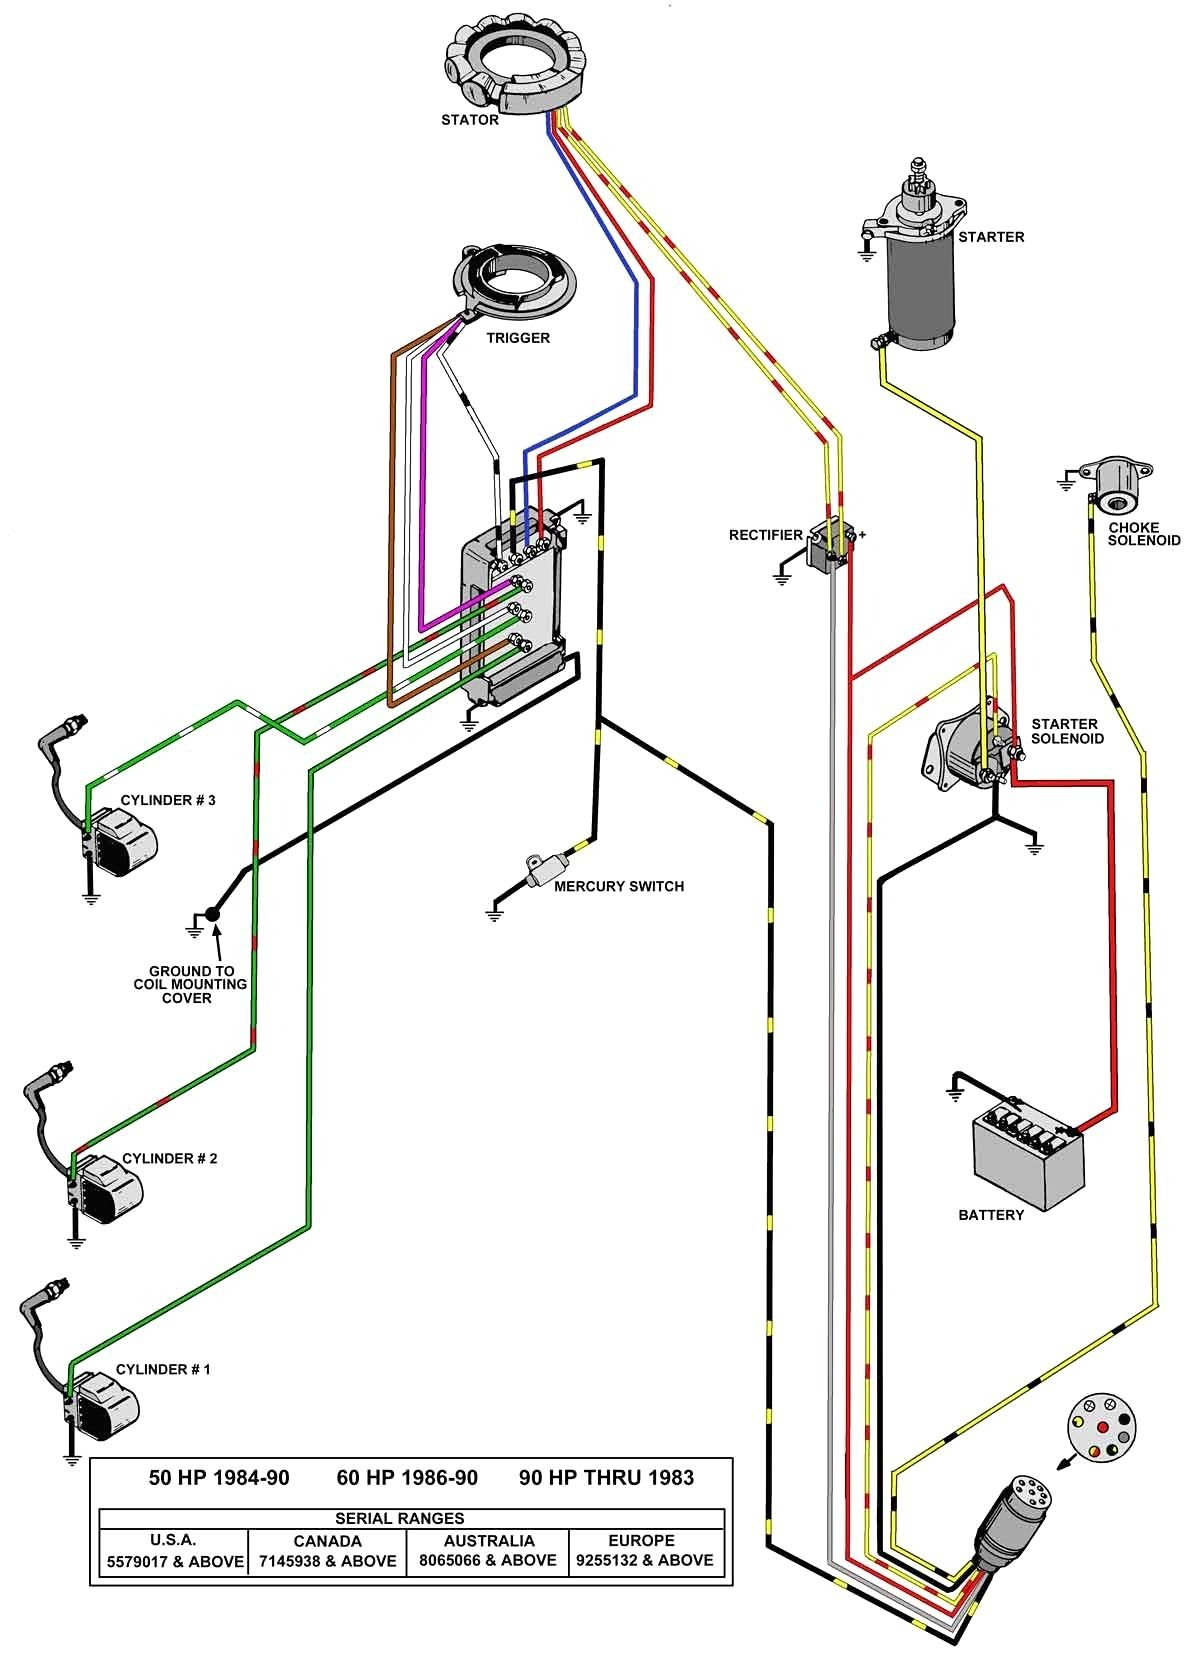 Mercury Marine Ignition Switch Wiring Diagram | Wiringdiagram - Boat Ignition Switch Wiring Diagram